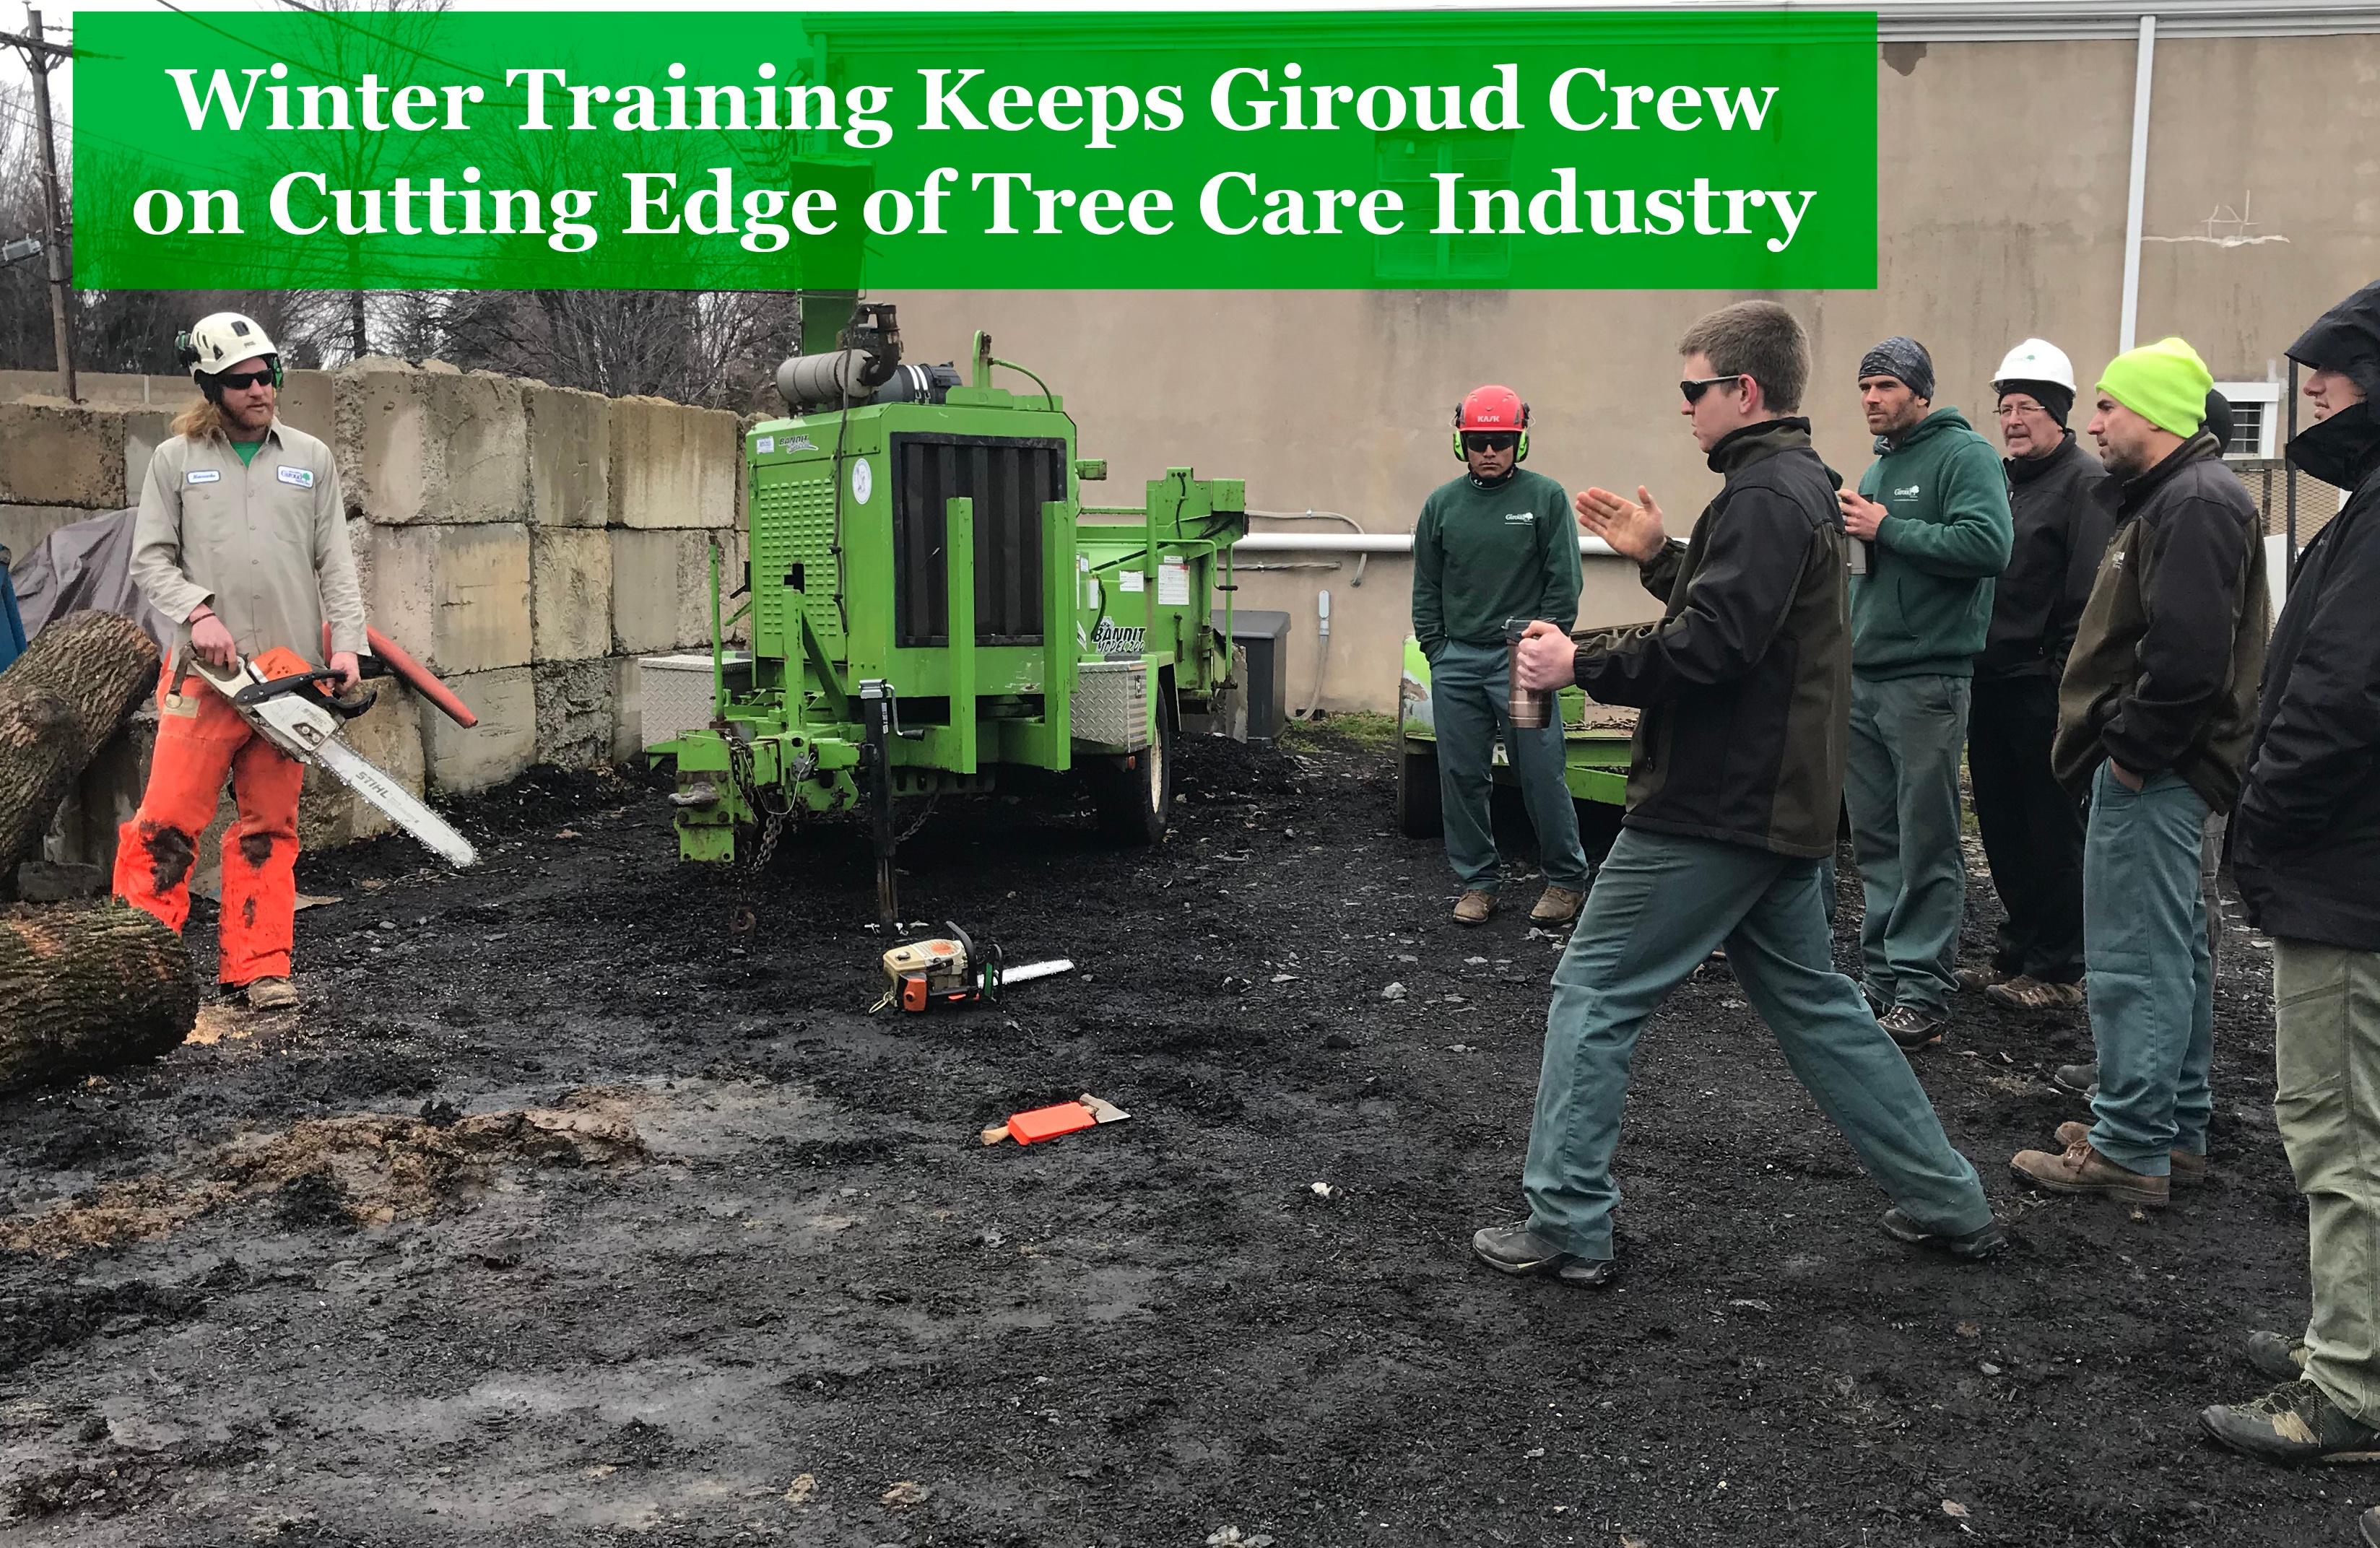 2018-Winter-Training-Keeps-Giroud-Crew-on-cutting-Edge-of-Tree-Care-Industry-Header.jpg